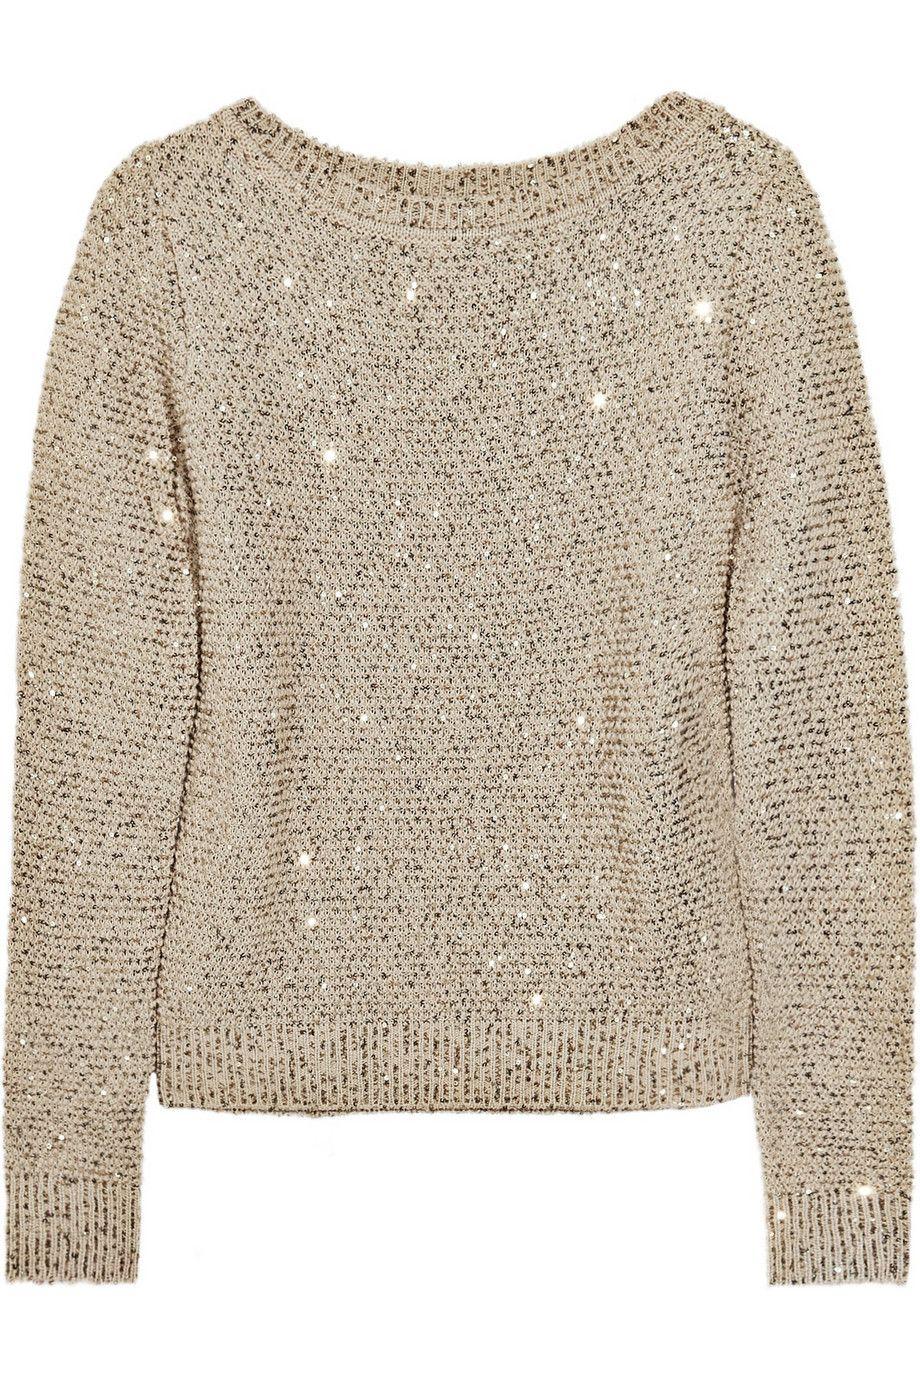 Oscar de la Renta Sequined silk and cotton-blend sweater | Style ...